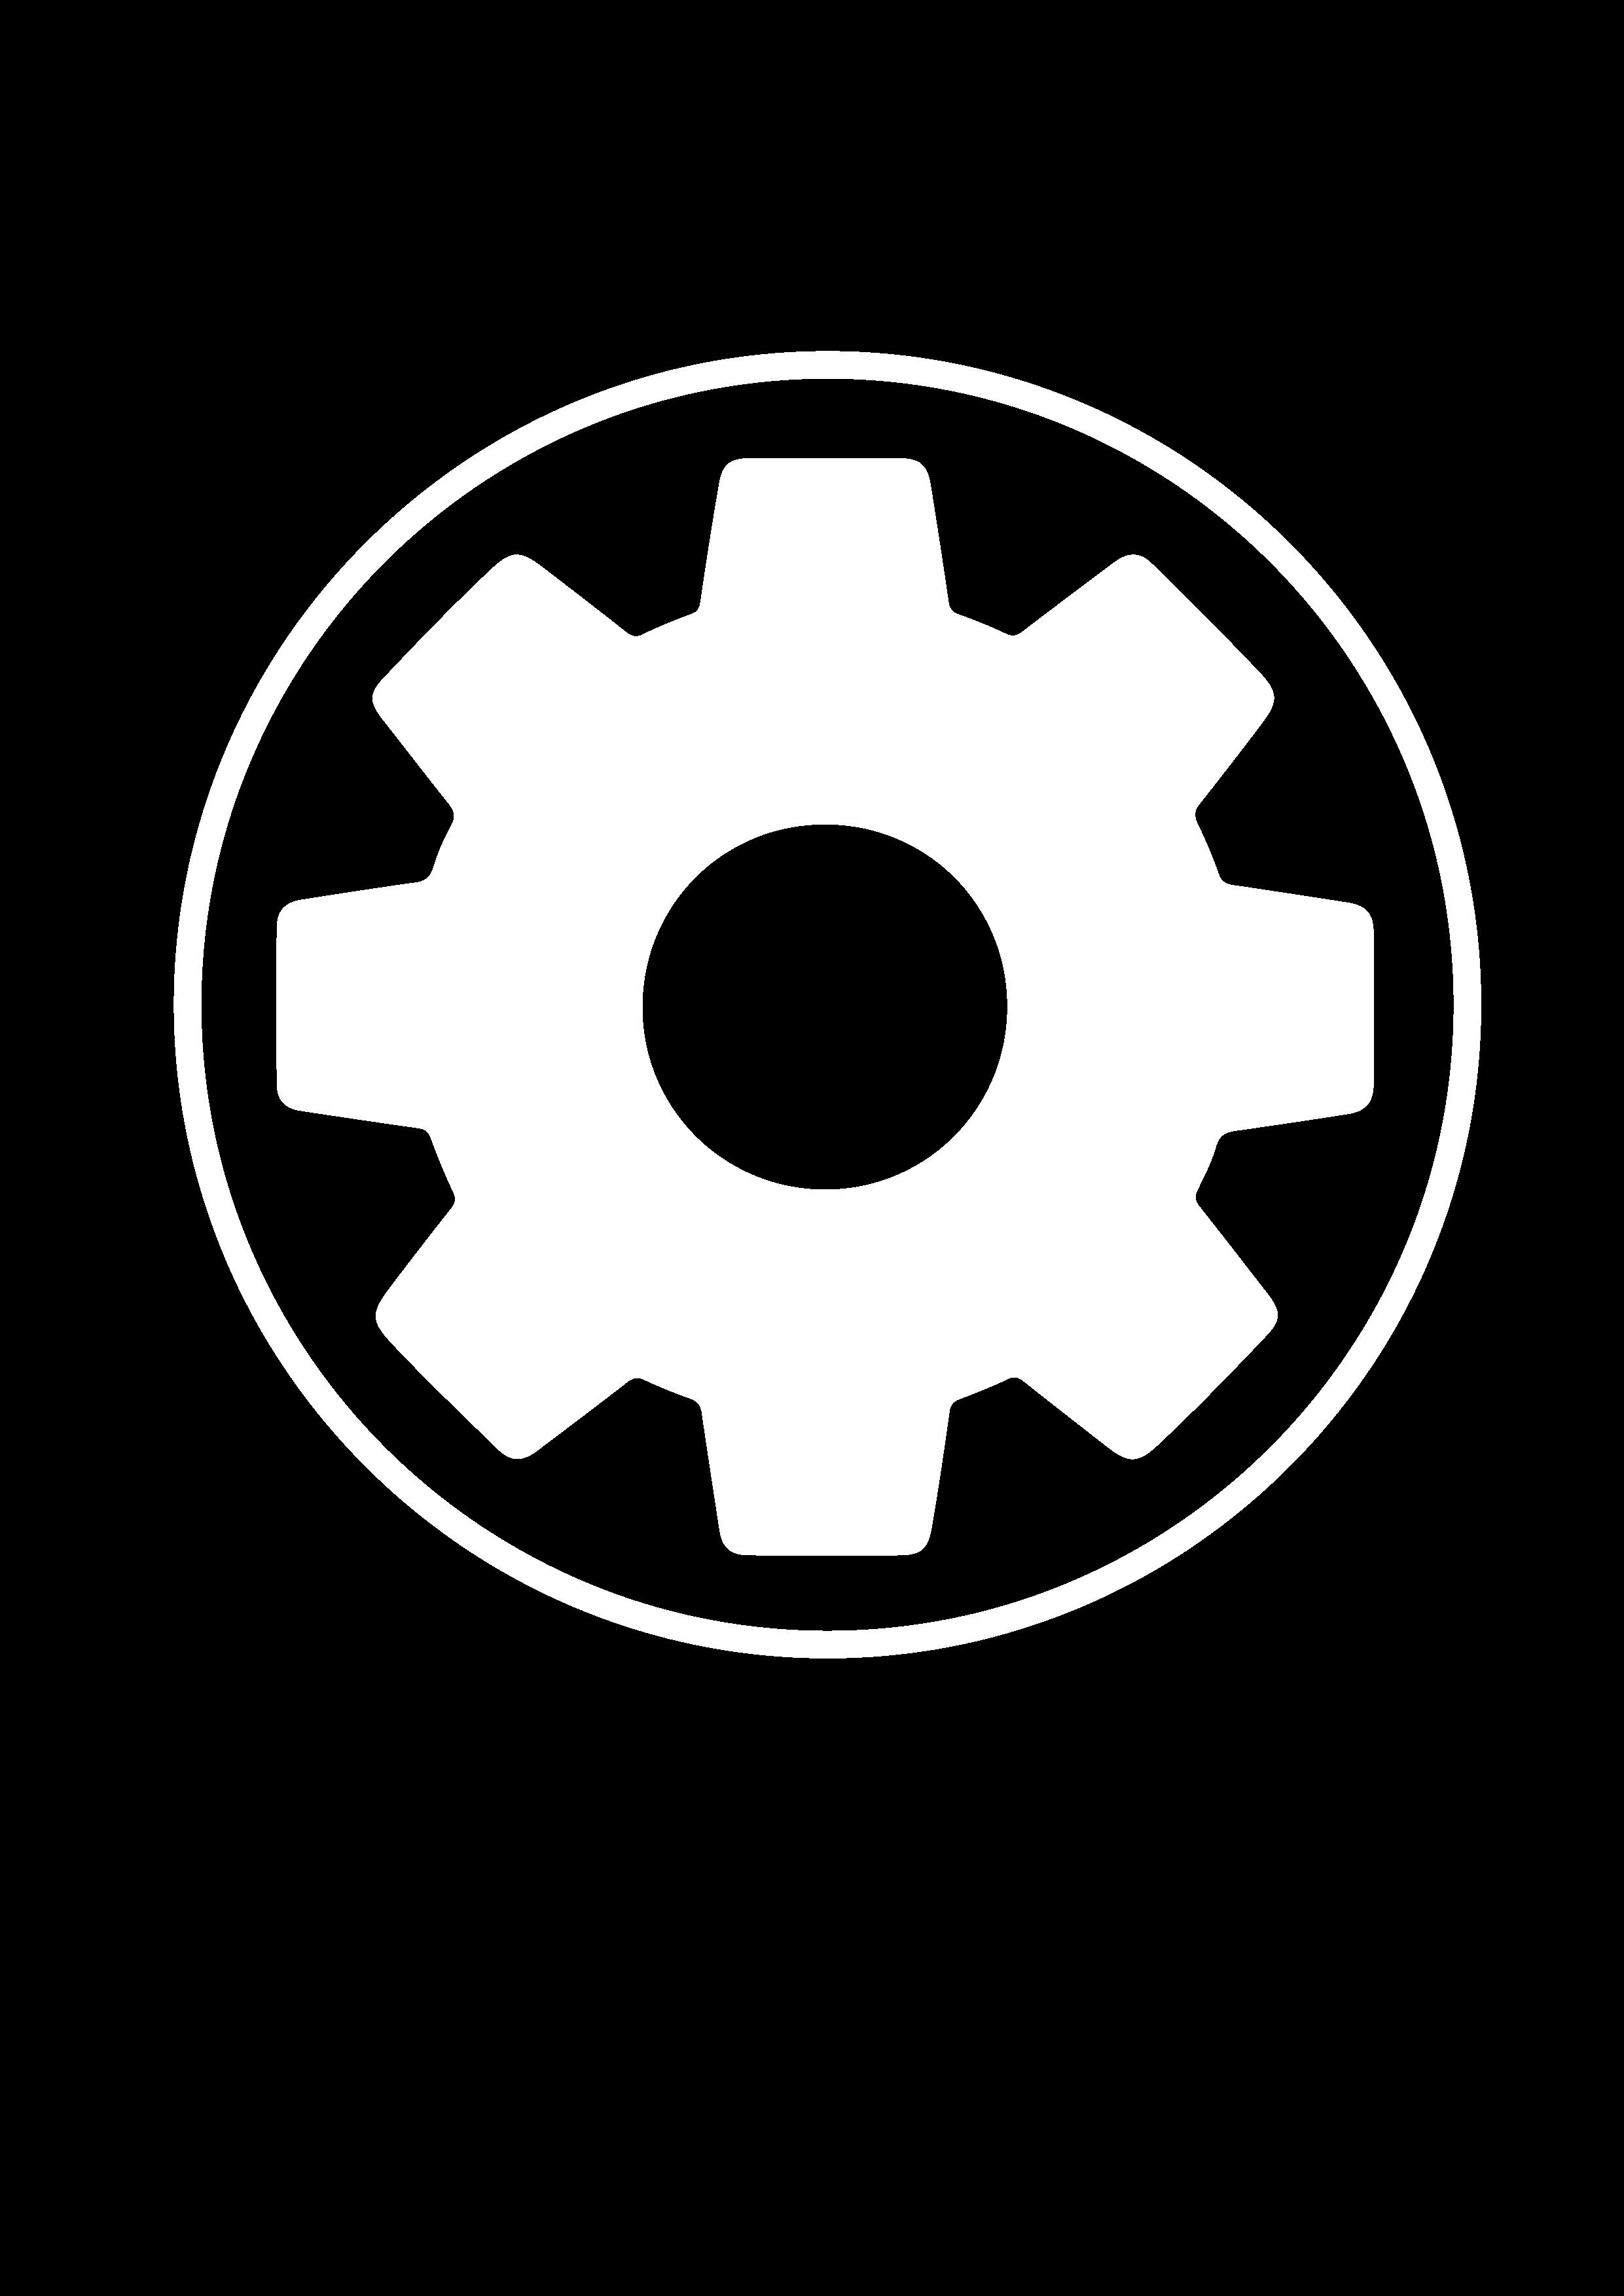 COG-01